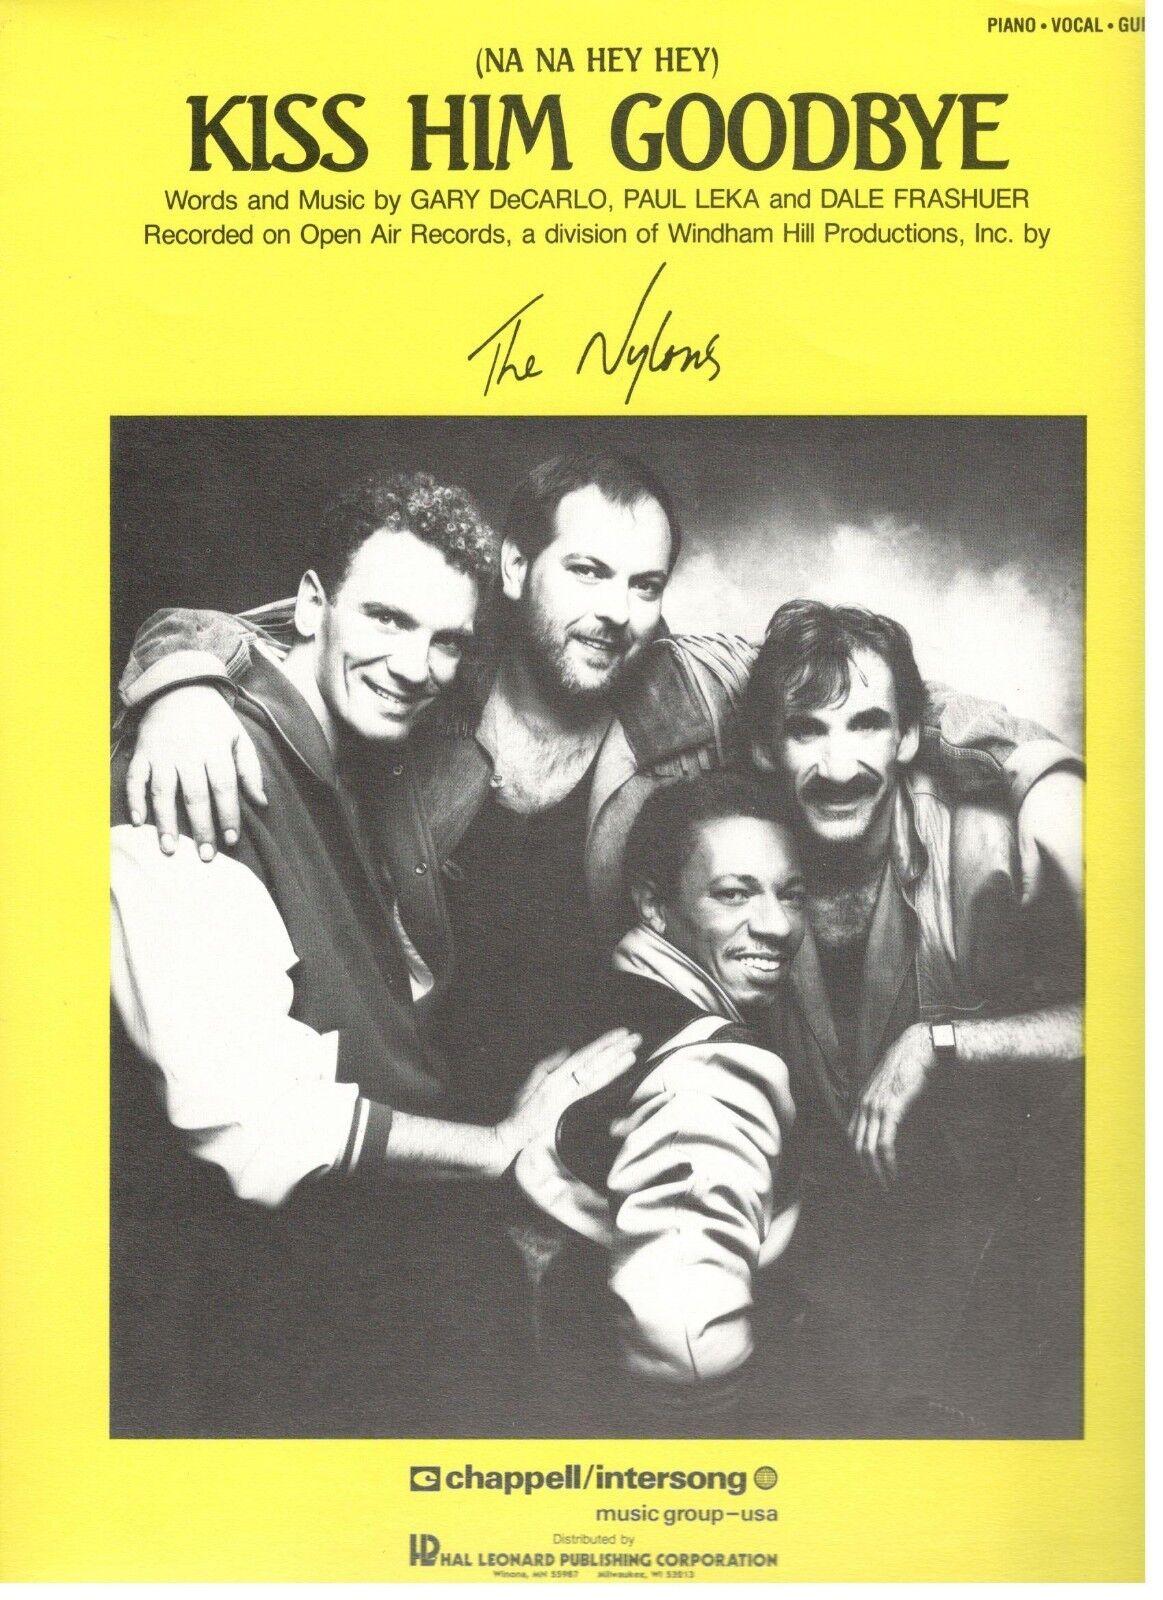 THE NYLONS (NA NA HEY HEY) KISS HIM GOODBYE-SHEET MUSIC-PIANO/V/GUITAR-1969-NEW